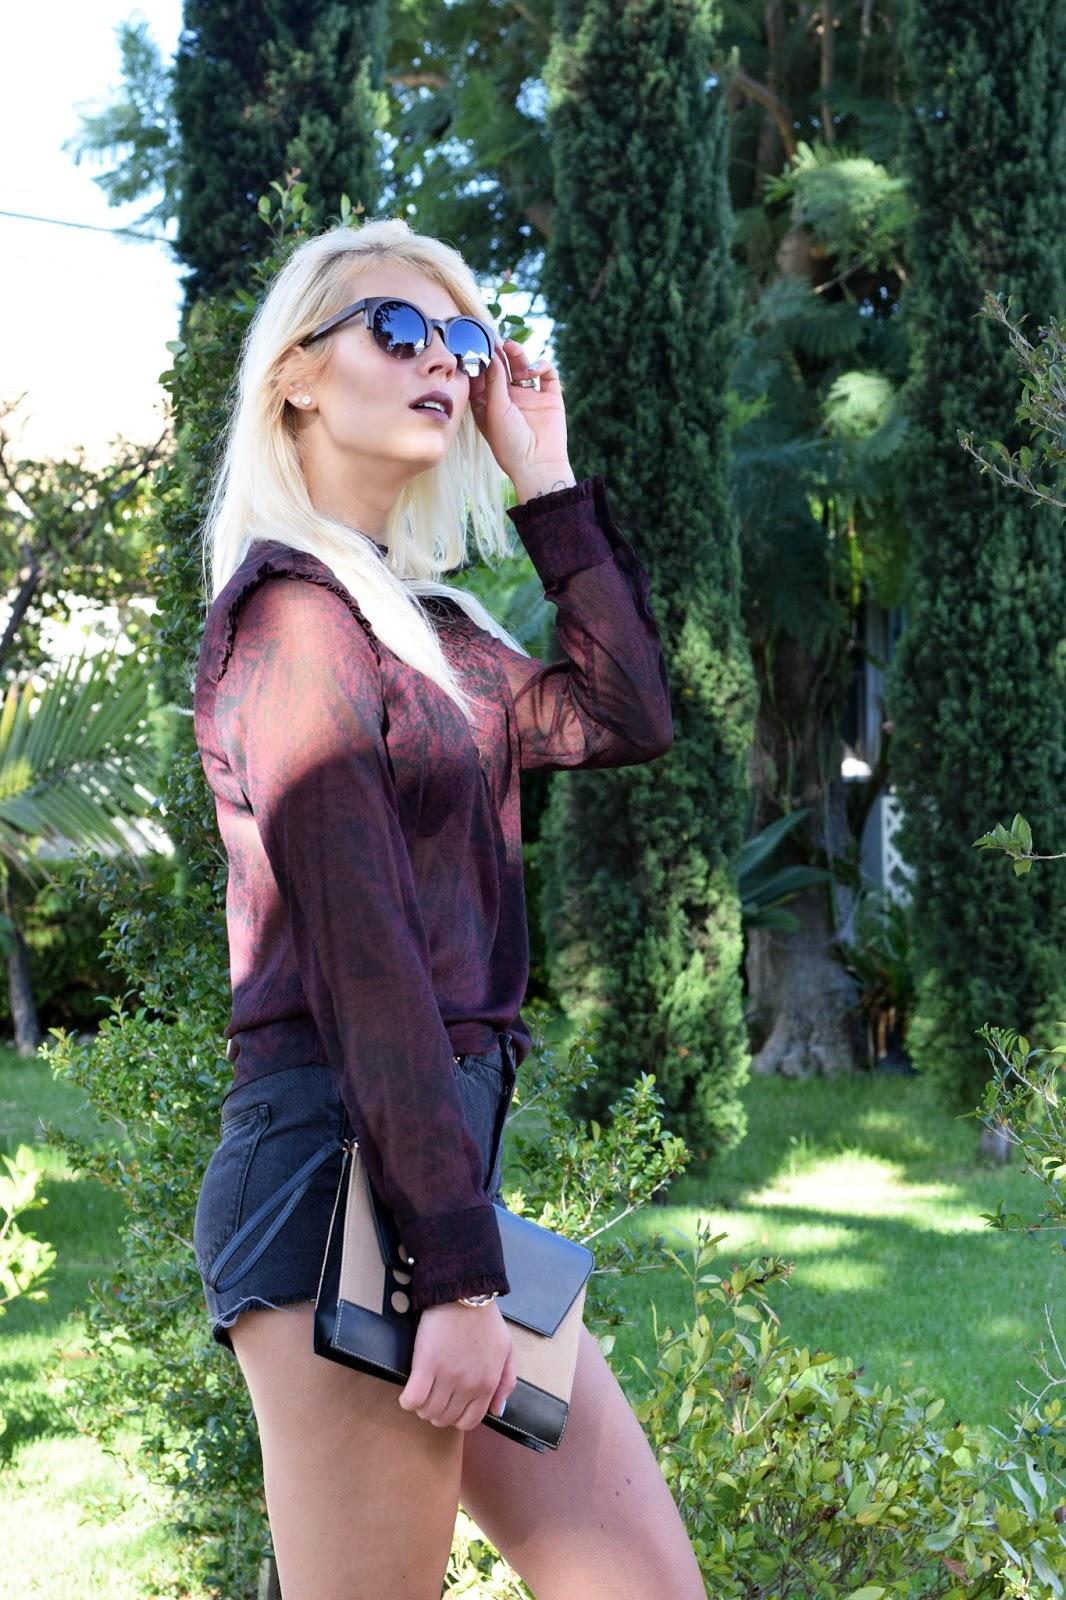 TIJN eyewear, eyewear, sunnies, sunglasses, wooden sunglasses, wood, tijn, uv protection, sun protection, who what wear, target style